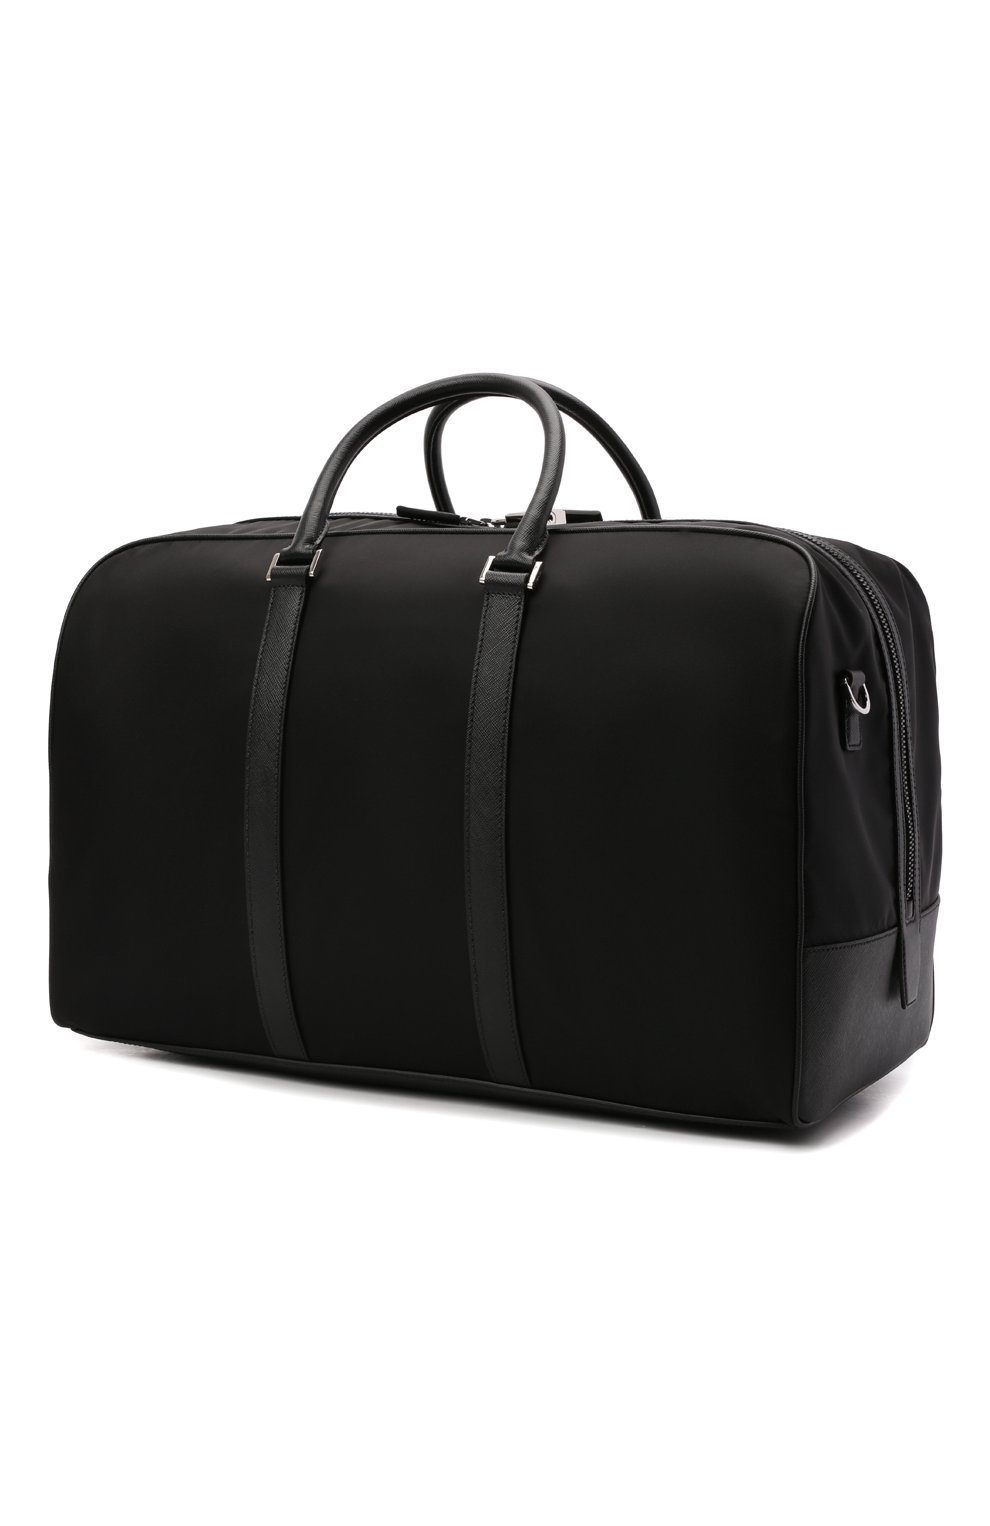 Мужская дорожная сумка PRADA черного цвета, арт. 2VC007-2DMH-F0002-SOO | Фото 3 (Материал: Текстиль)